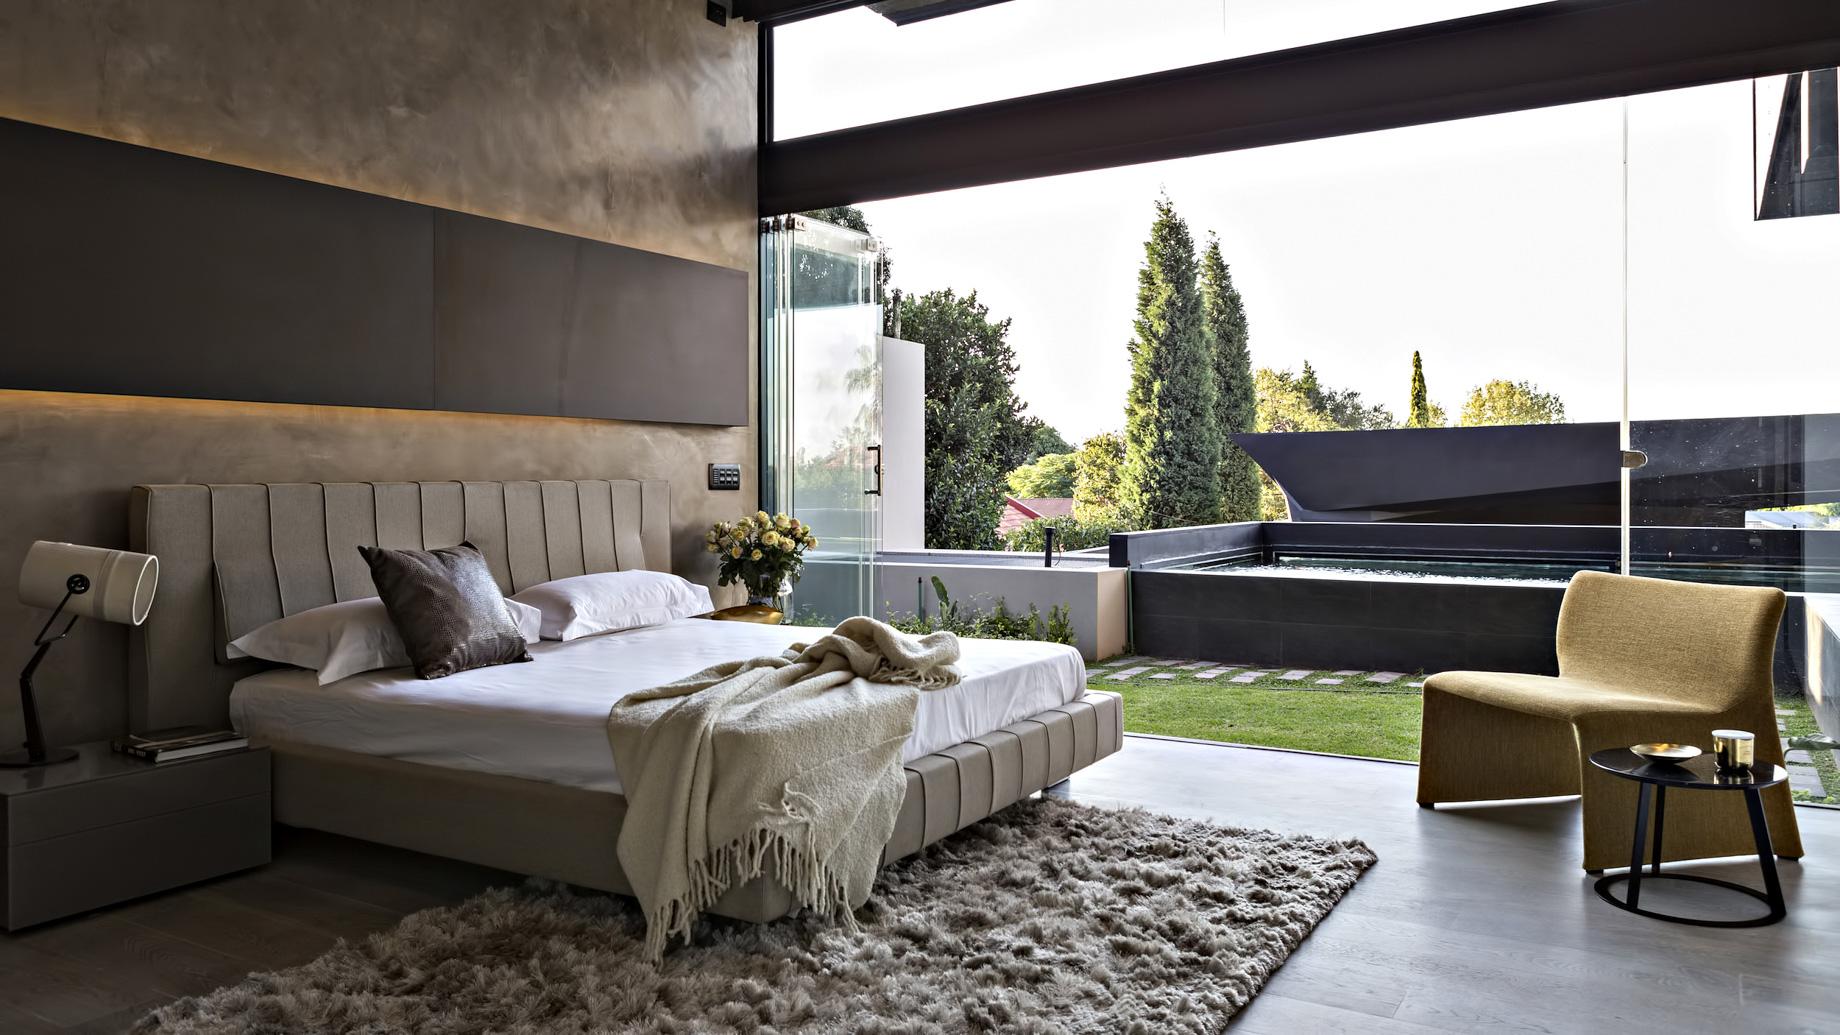 Kloof Ana House - Bedfordview, Gauteng, South Africa